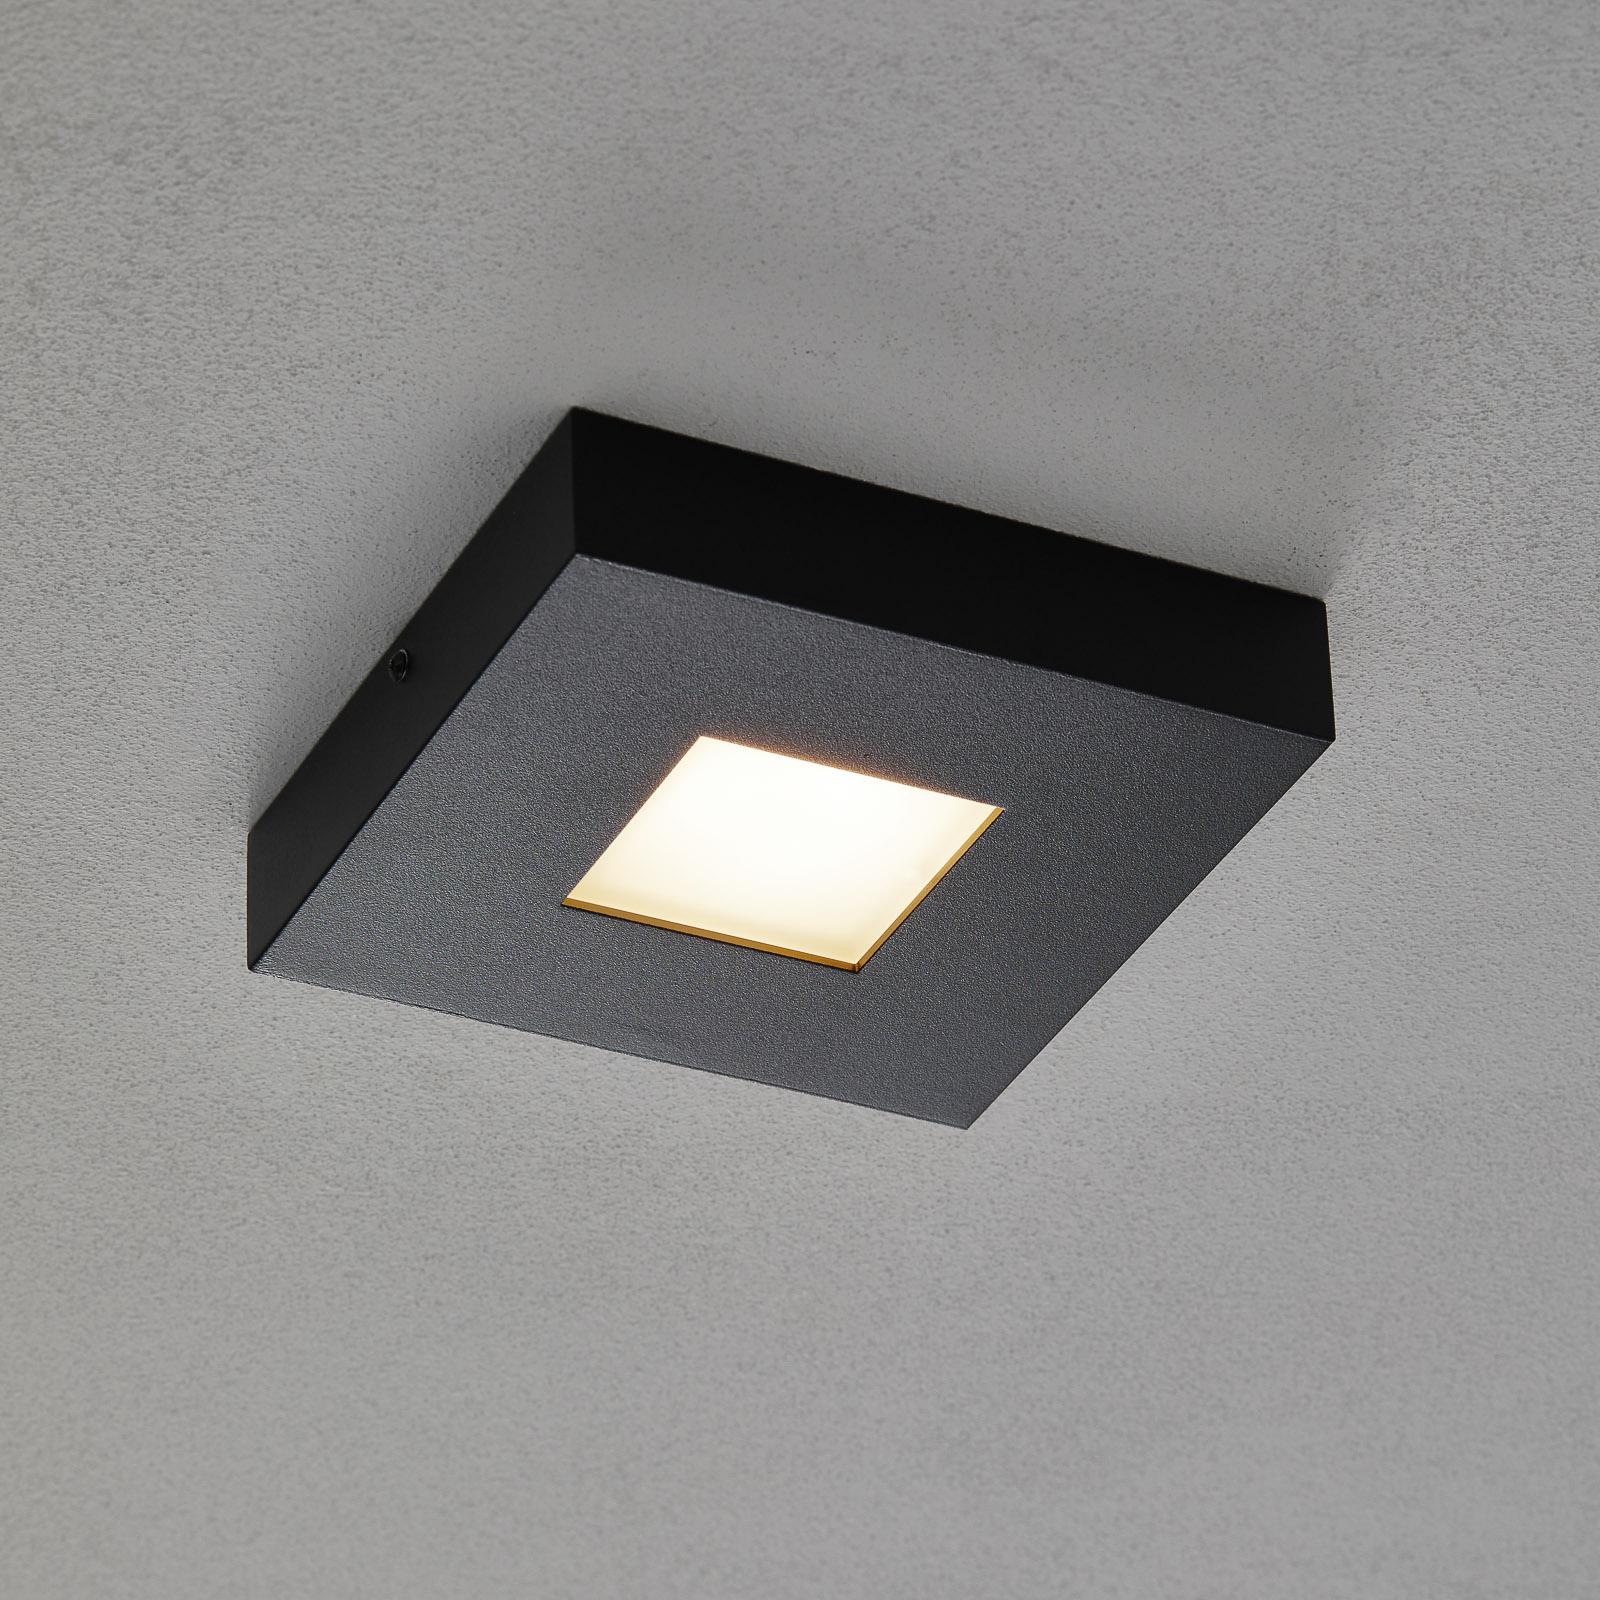 Plafón LED Cubus en negro